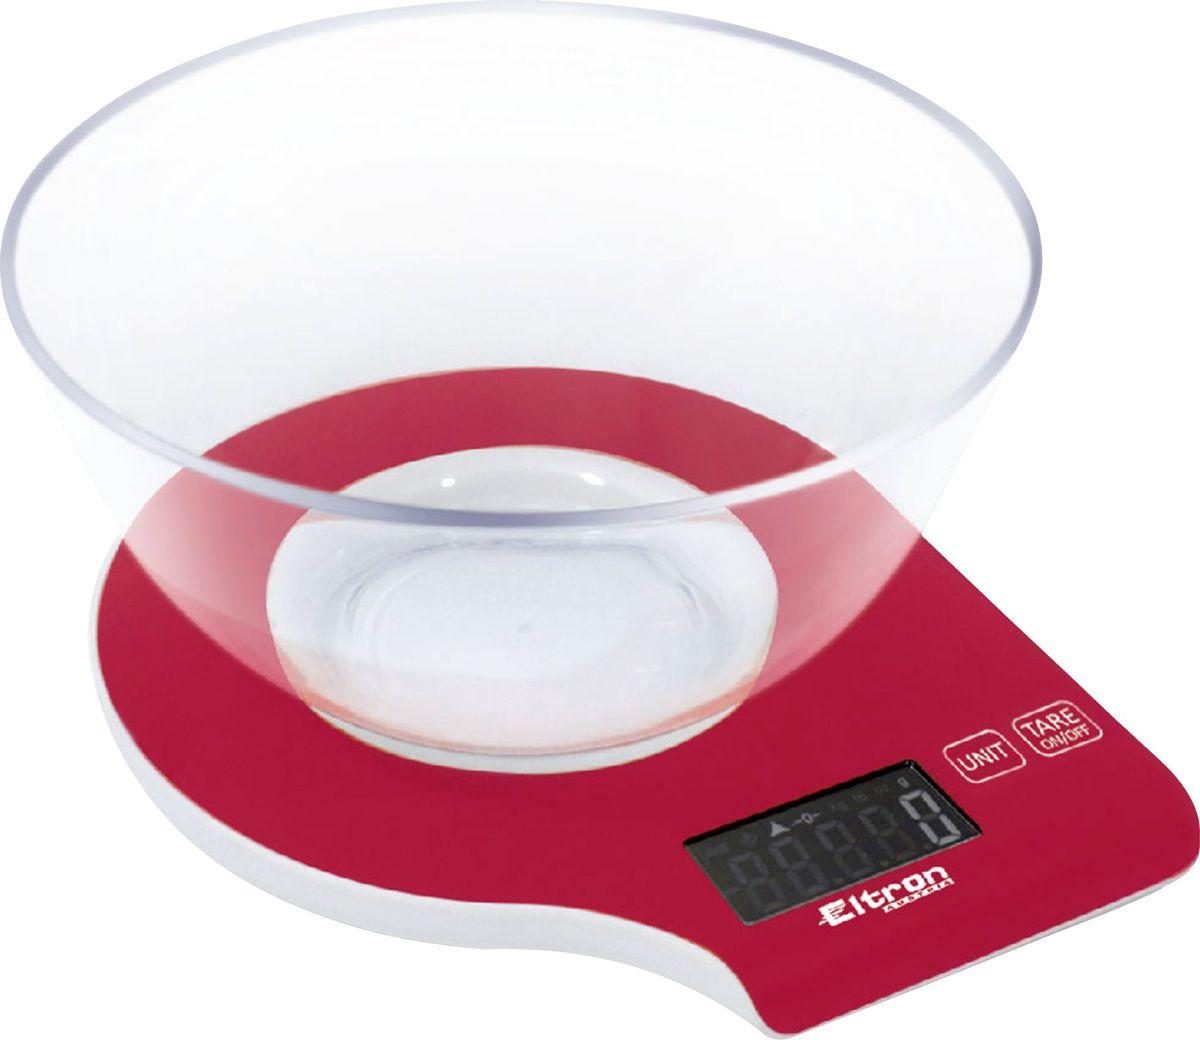 Весы кухонные Eltron, электронные, цвет: красный, до 5 кг. 9261EL весы eltron весы электронные